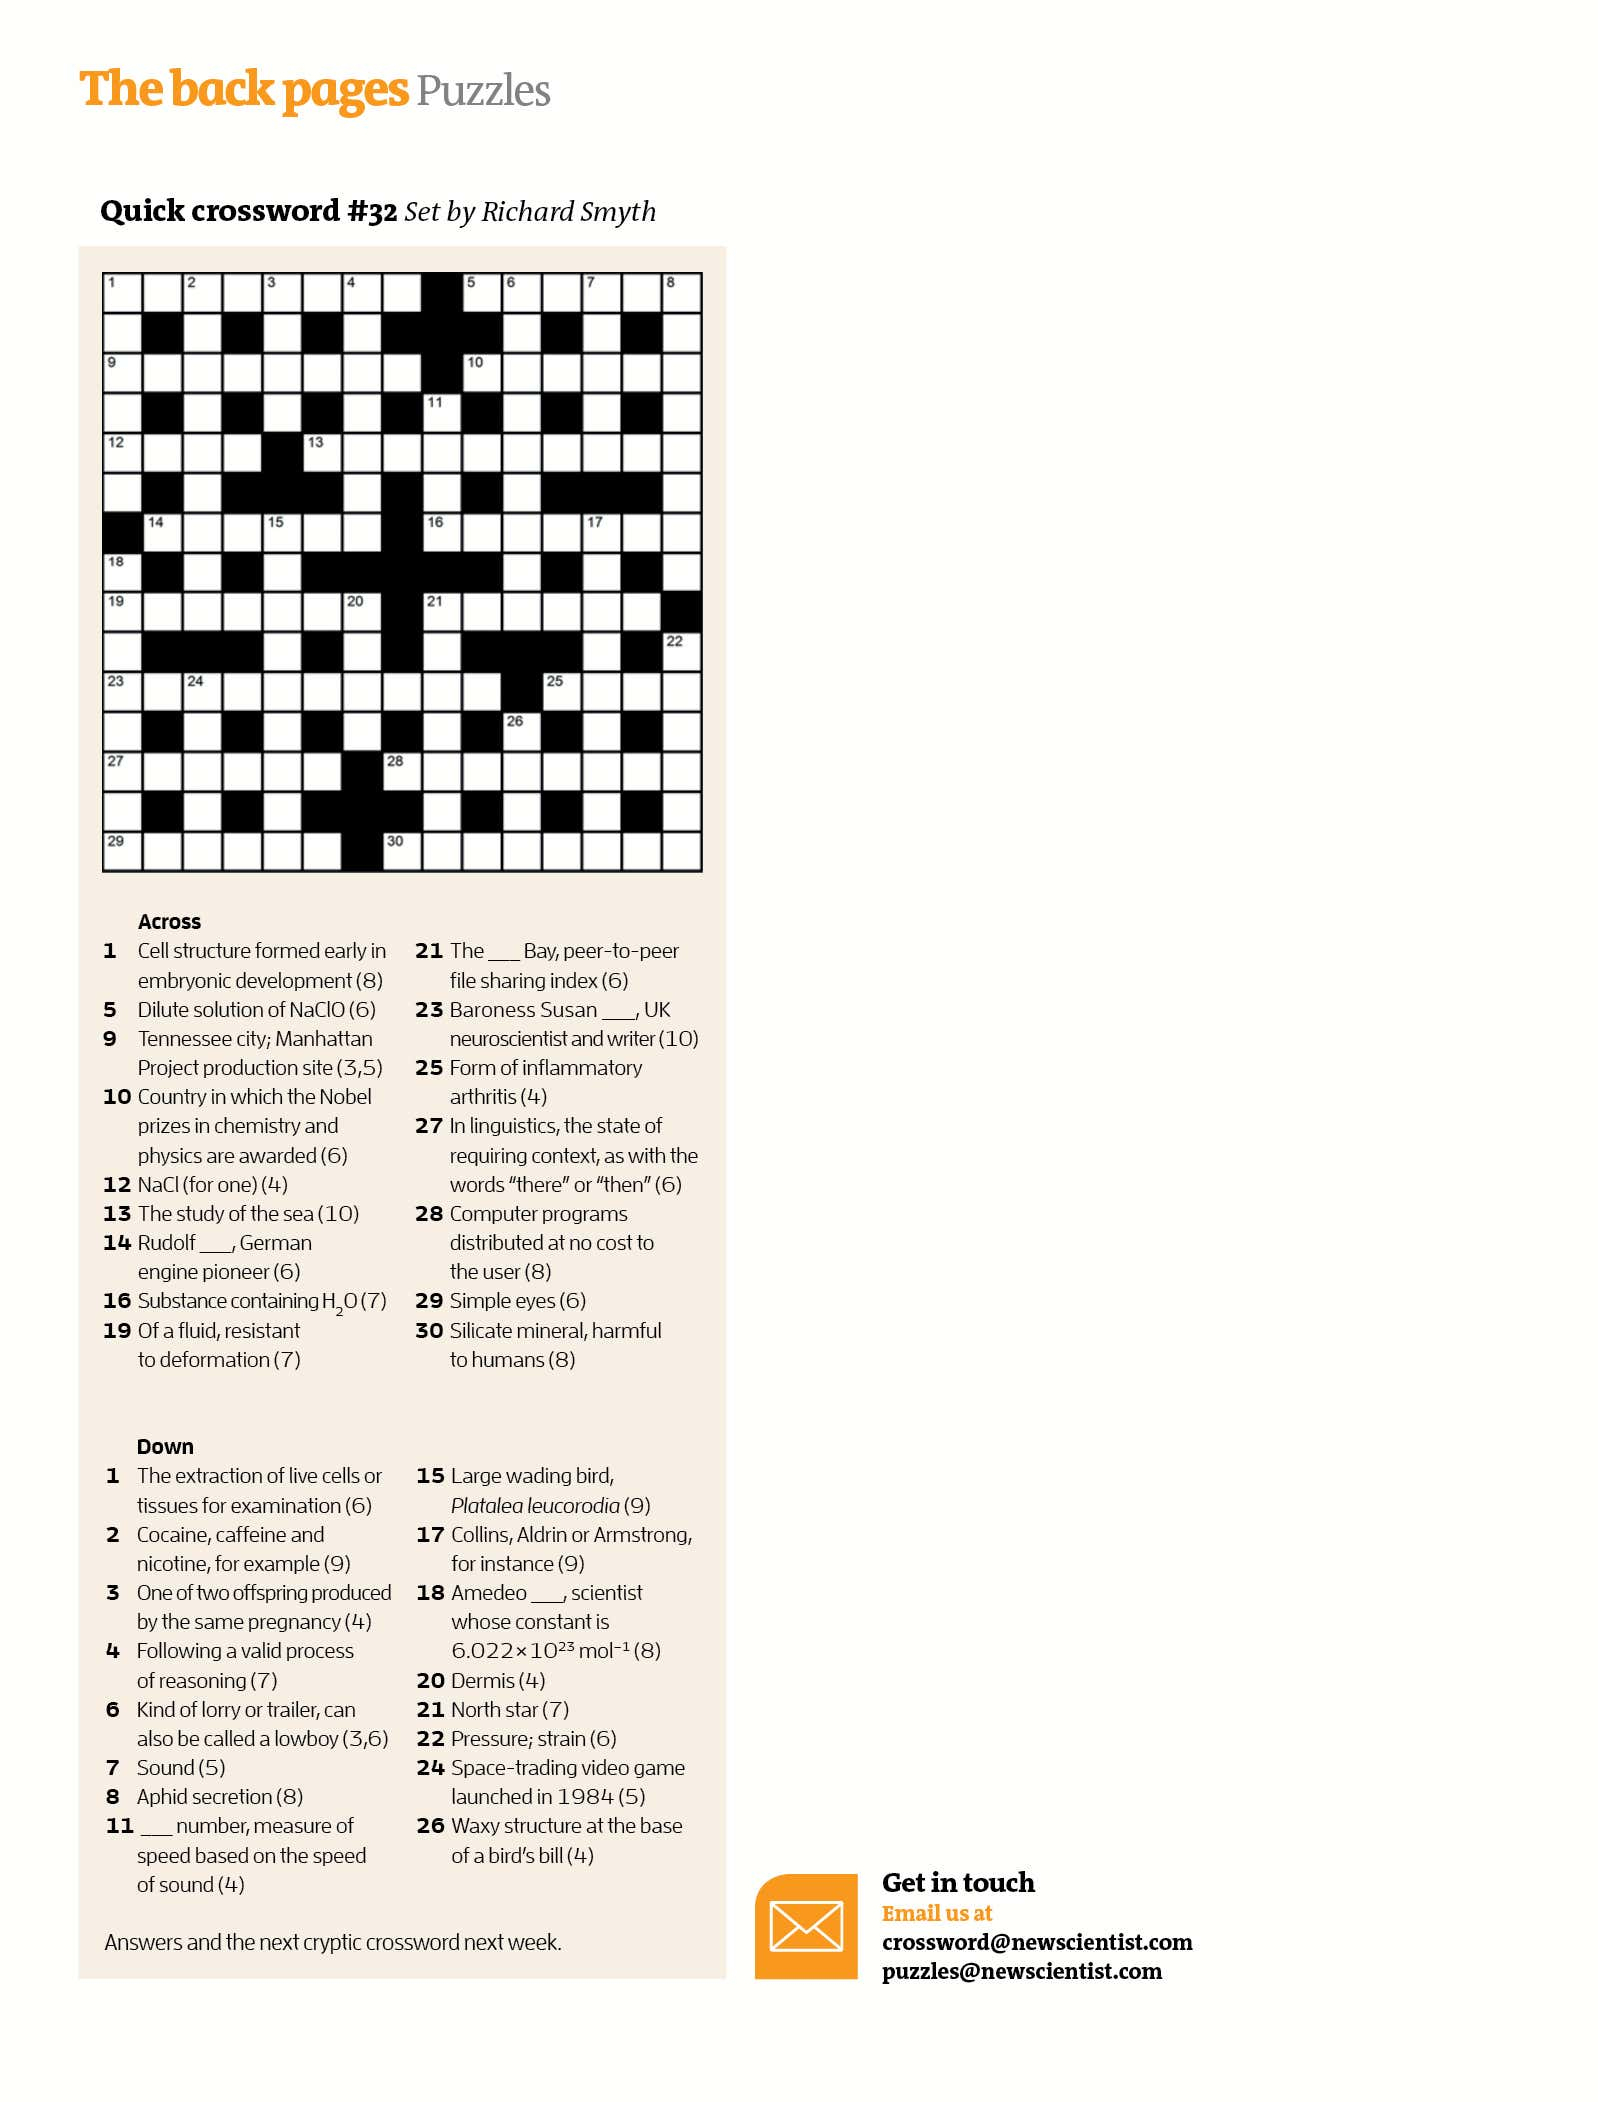 Quick Crossword #32   New Scientist - Daily Quick Crossword Printable Version